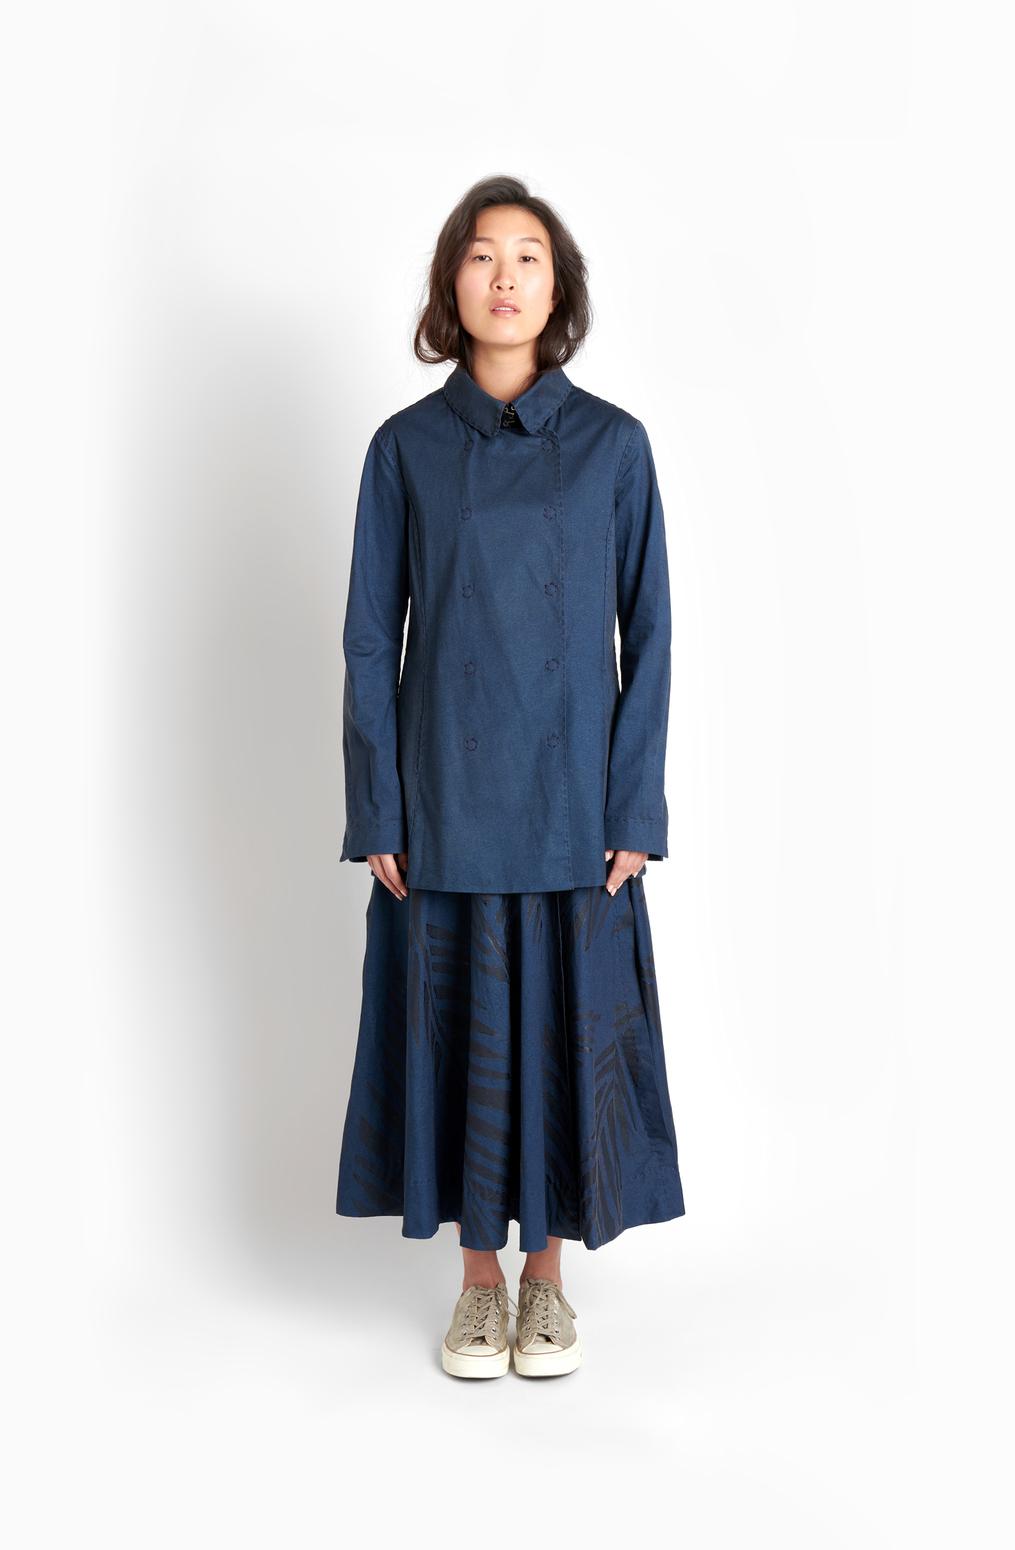 Alabama chanin leighton skirt